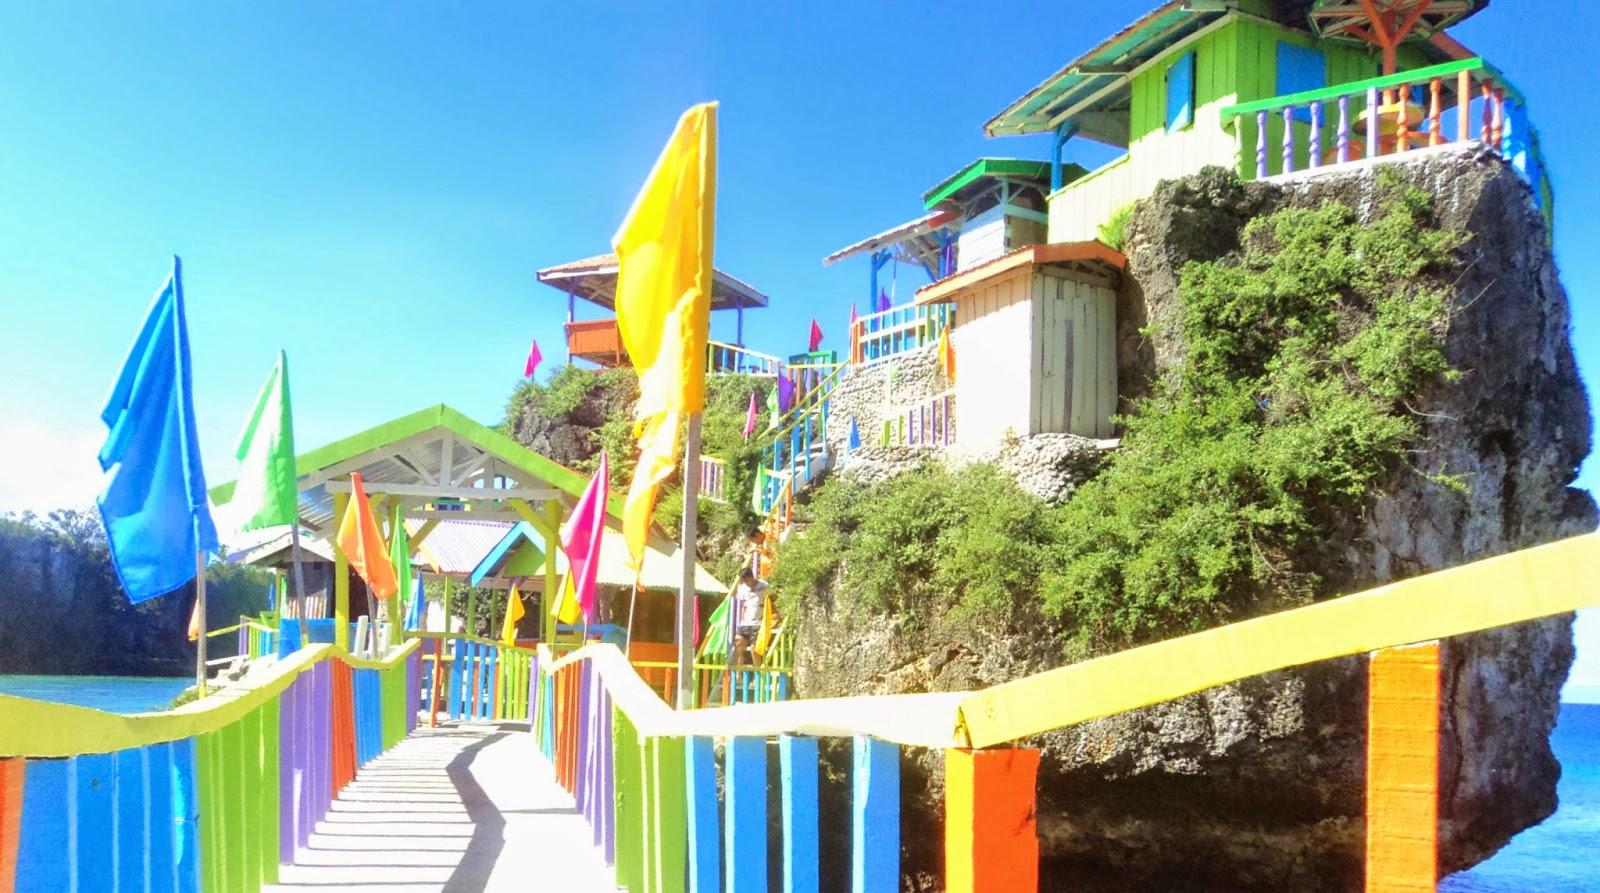 Medellin's Funtastic Island